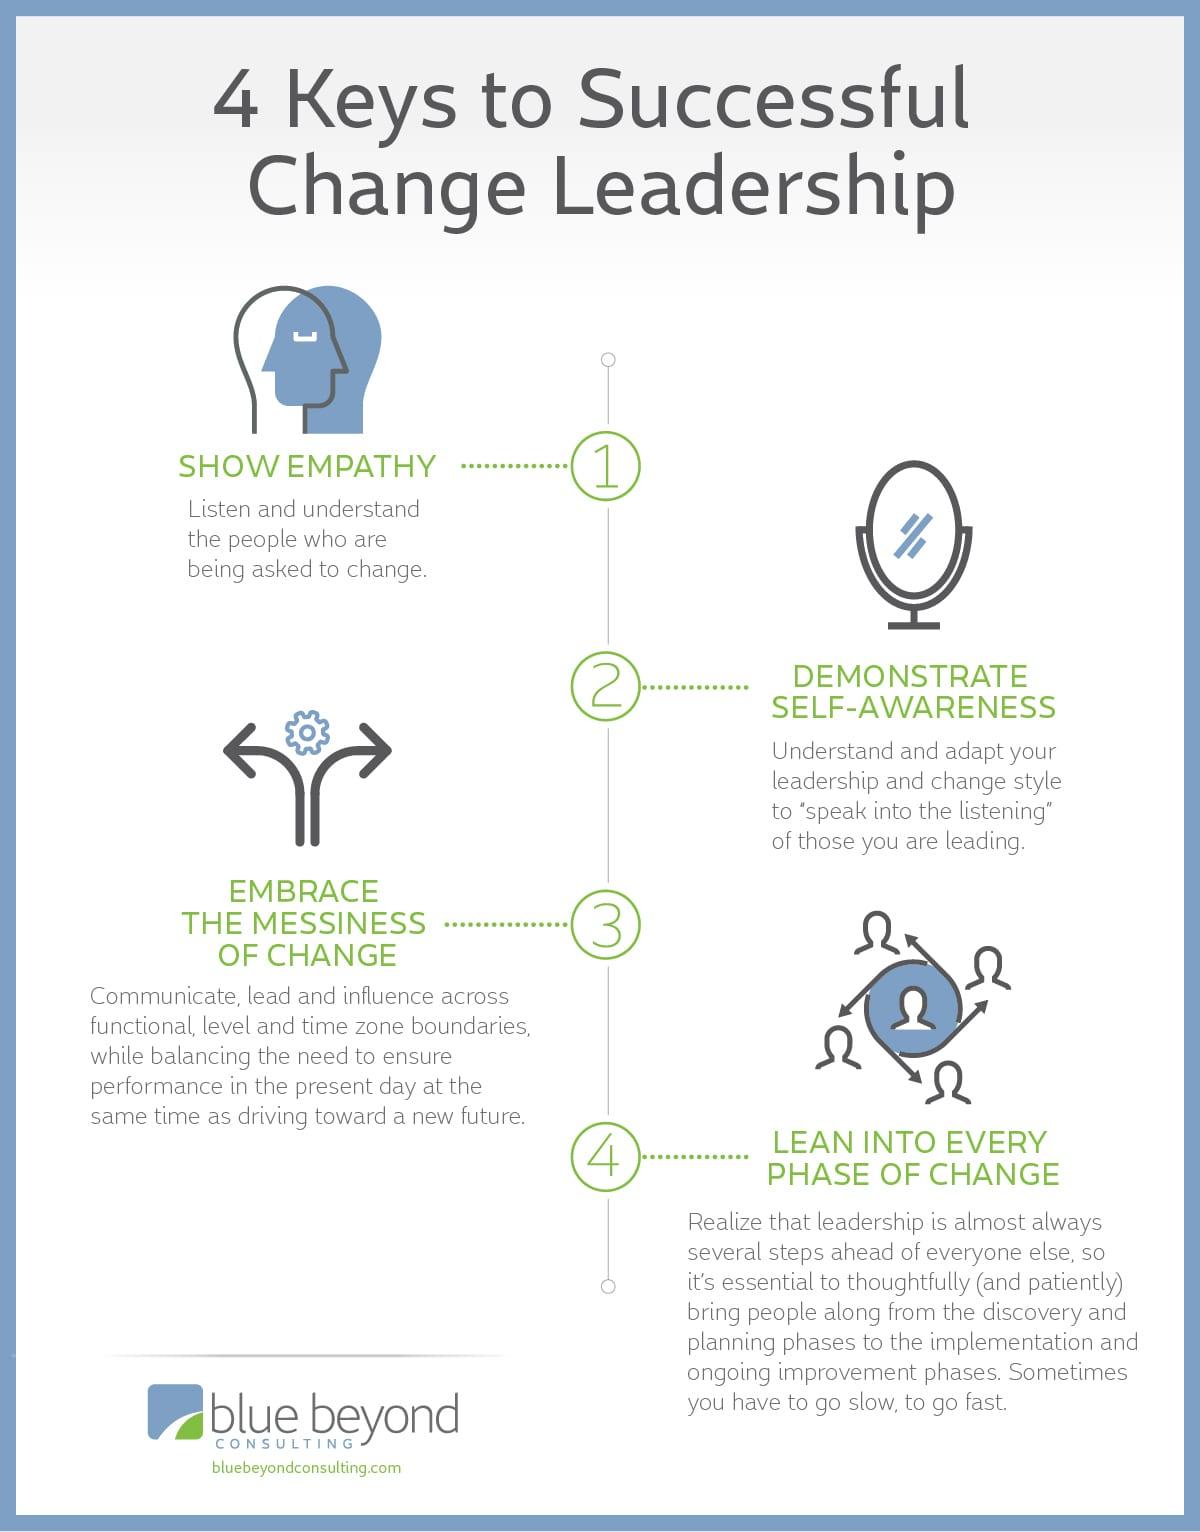 4 Keys to Successful Change Leadership